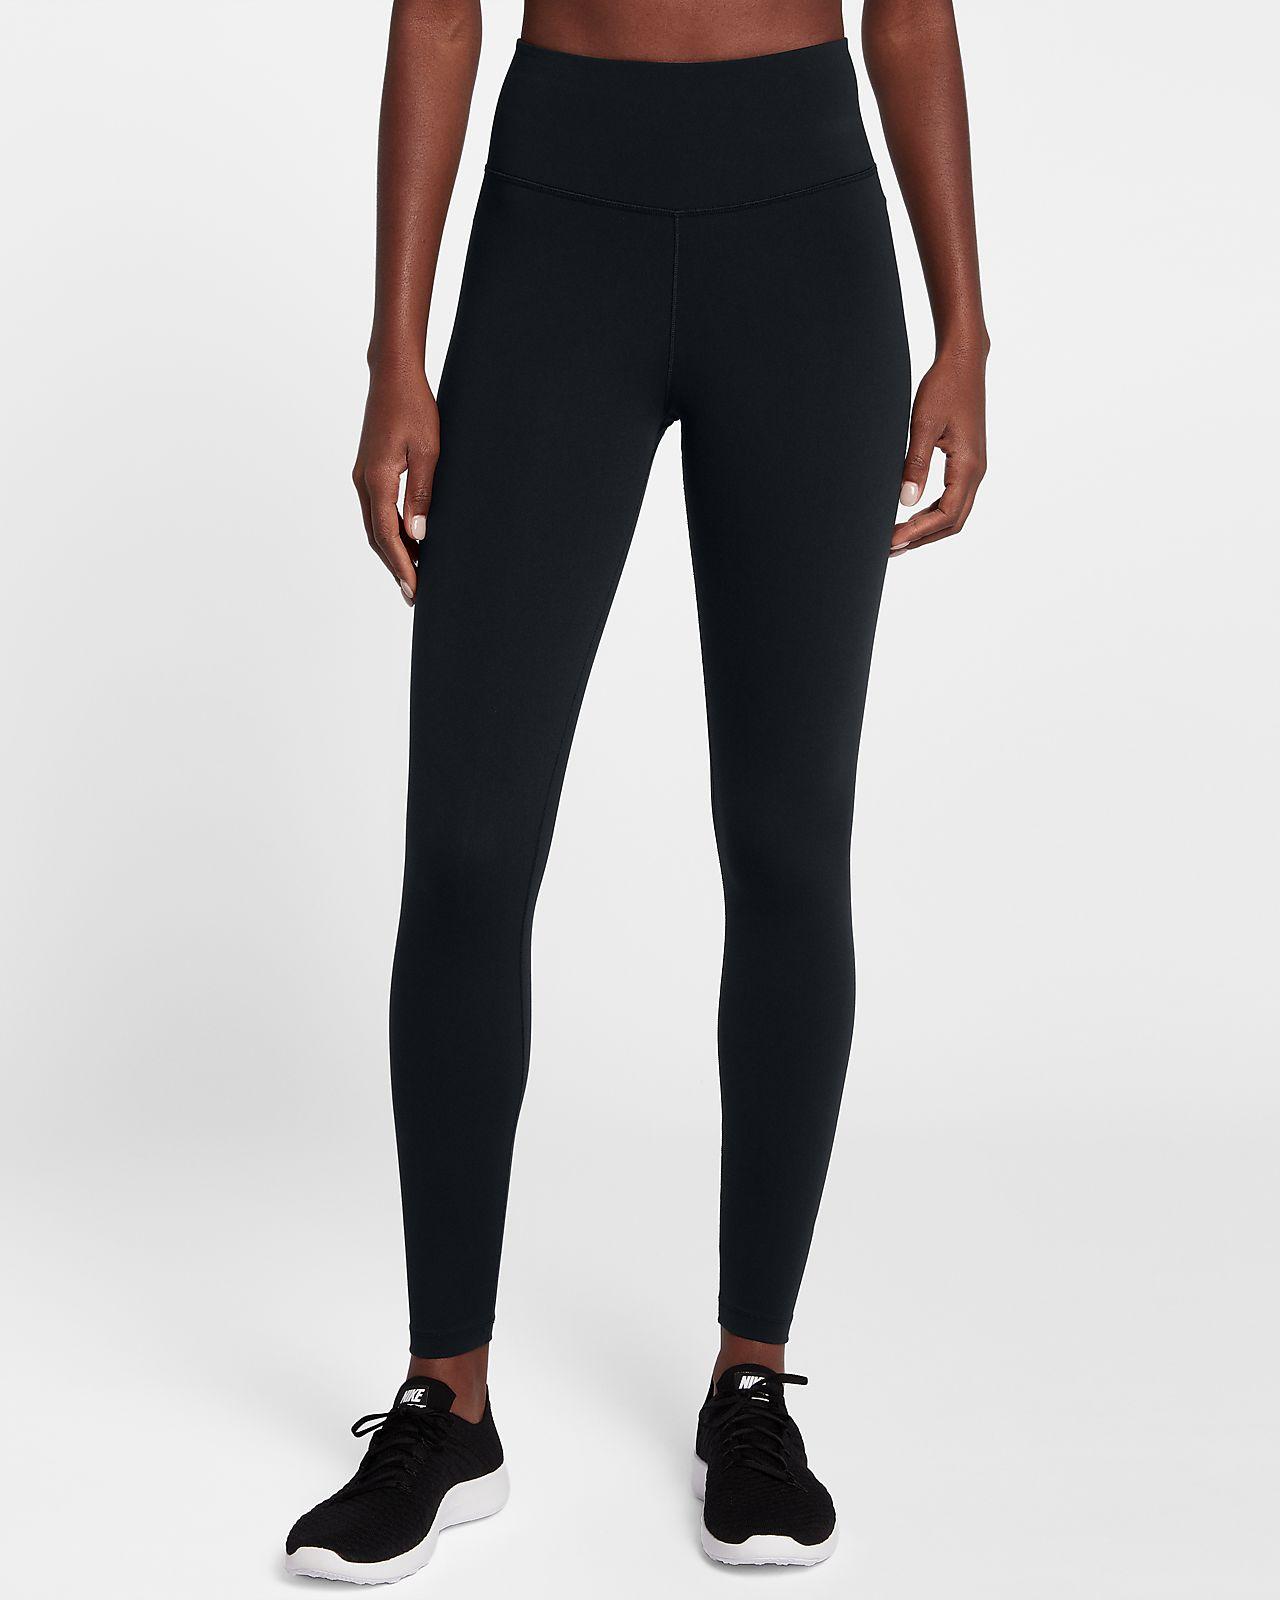 920a93bd7c Nike Sculpt Lux magas derekú, testhezálló női edzőnadrág. Nike.com HU